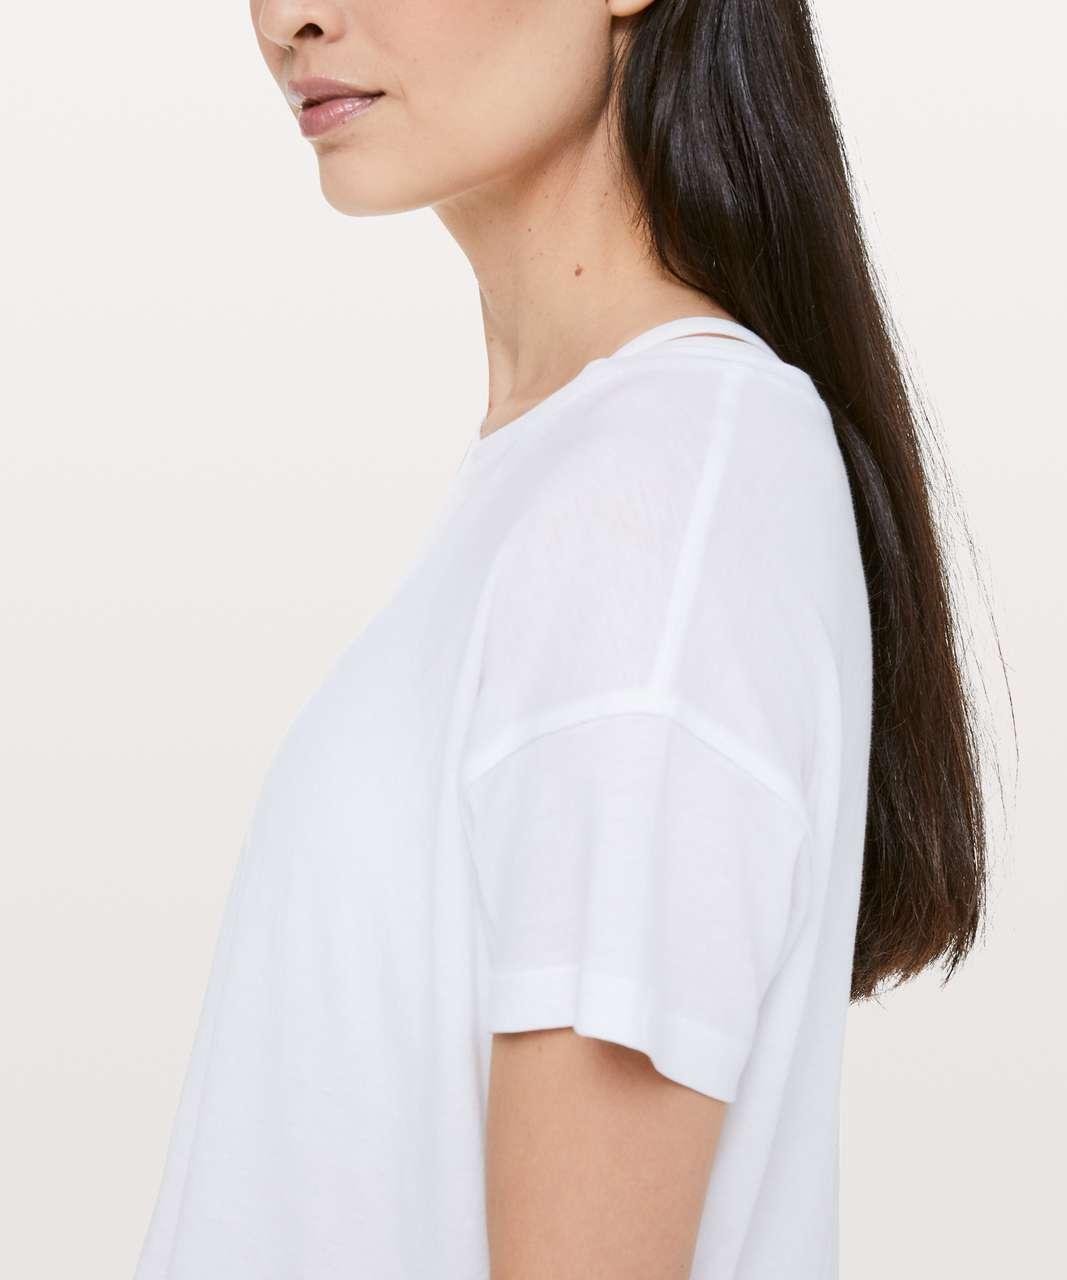 Lululemon Cates Tee *Light - White